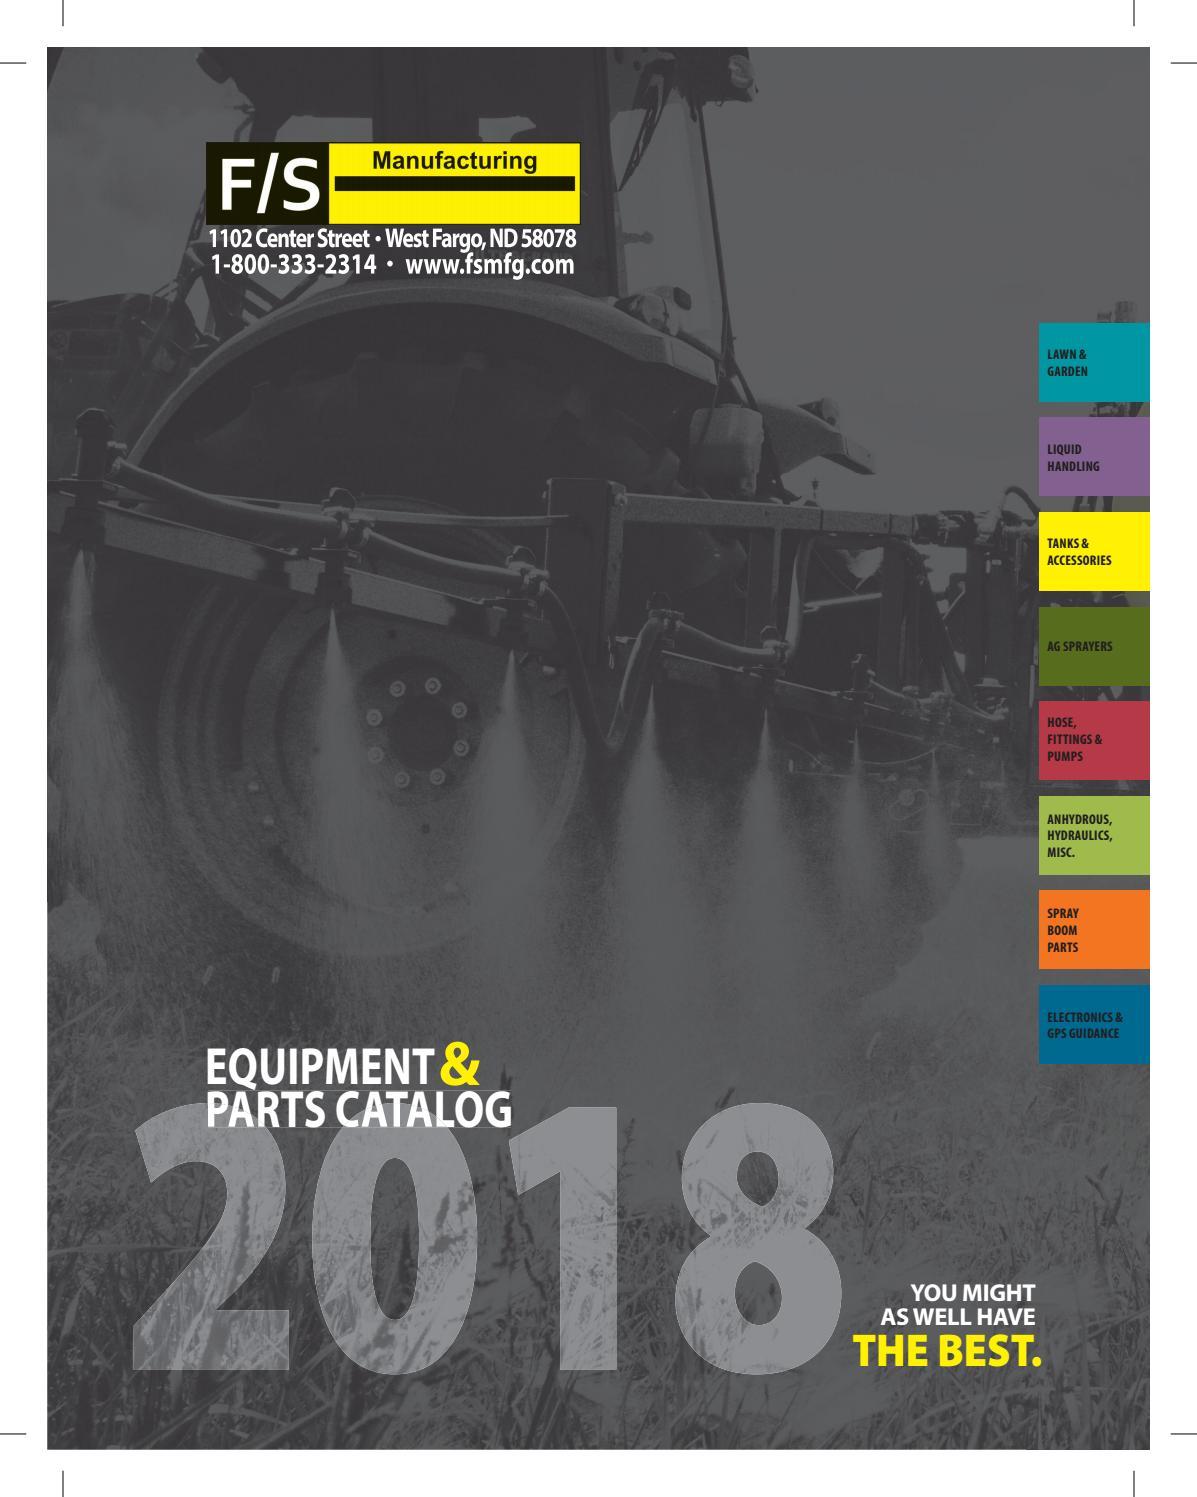 2018 Fs Manufacturing Catalog Final By Fsmfg Issuu Wiring Harness For Atv Sprayer